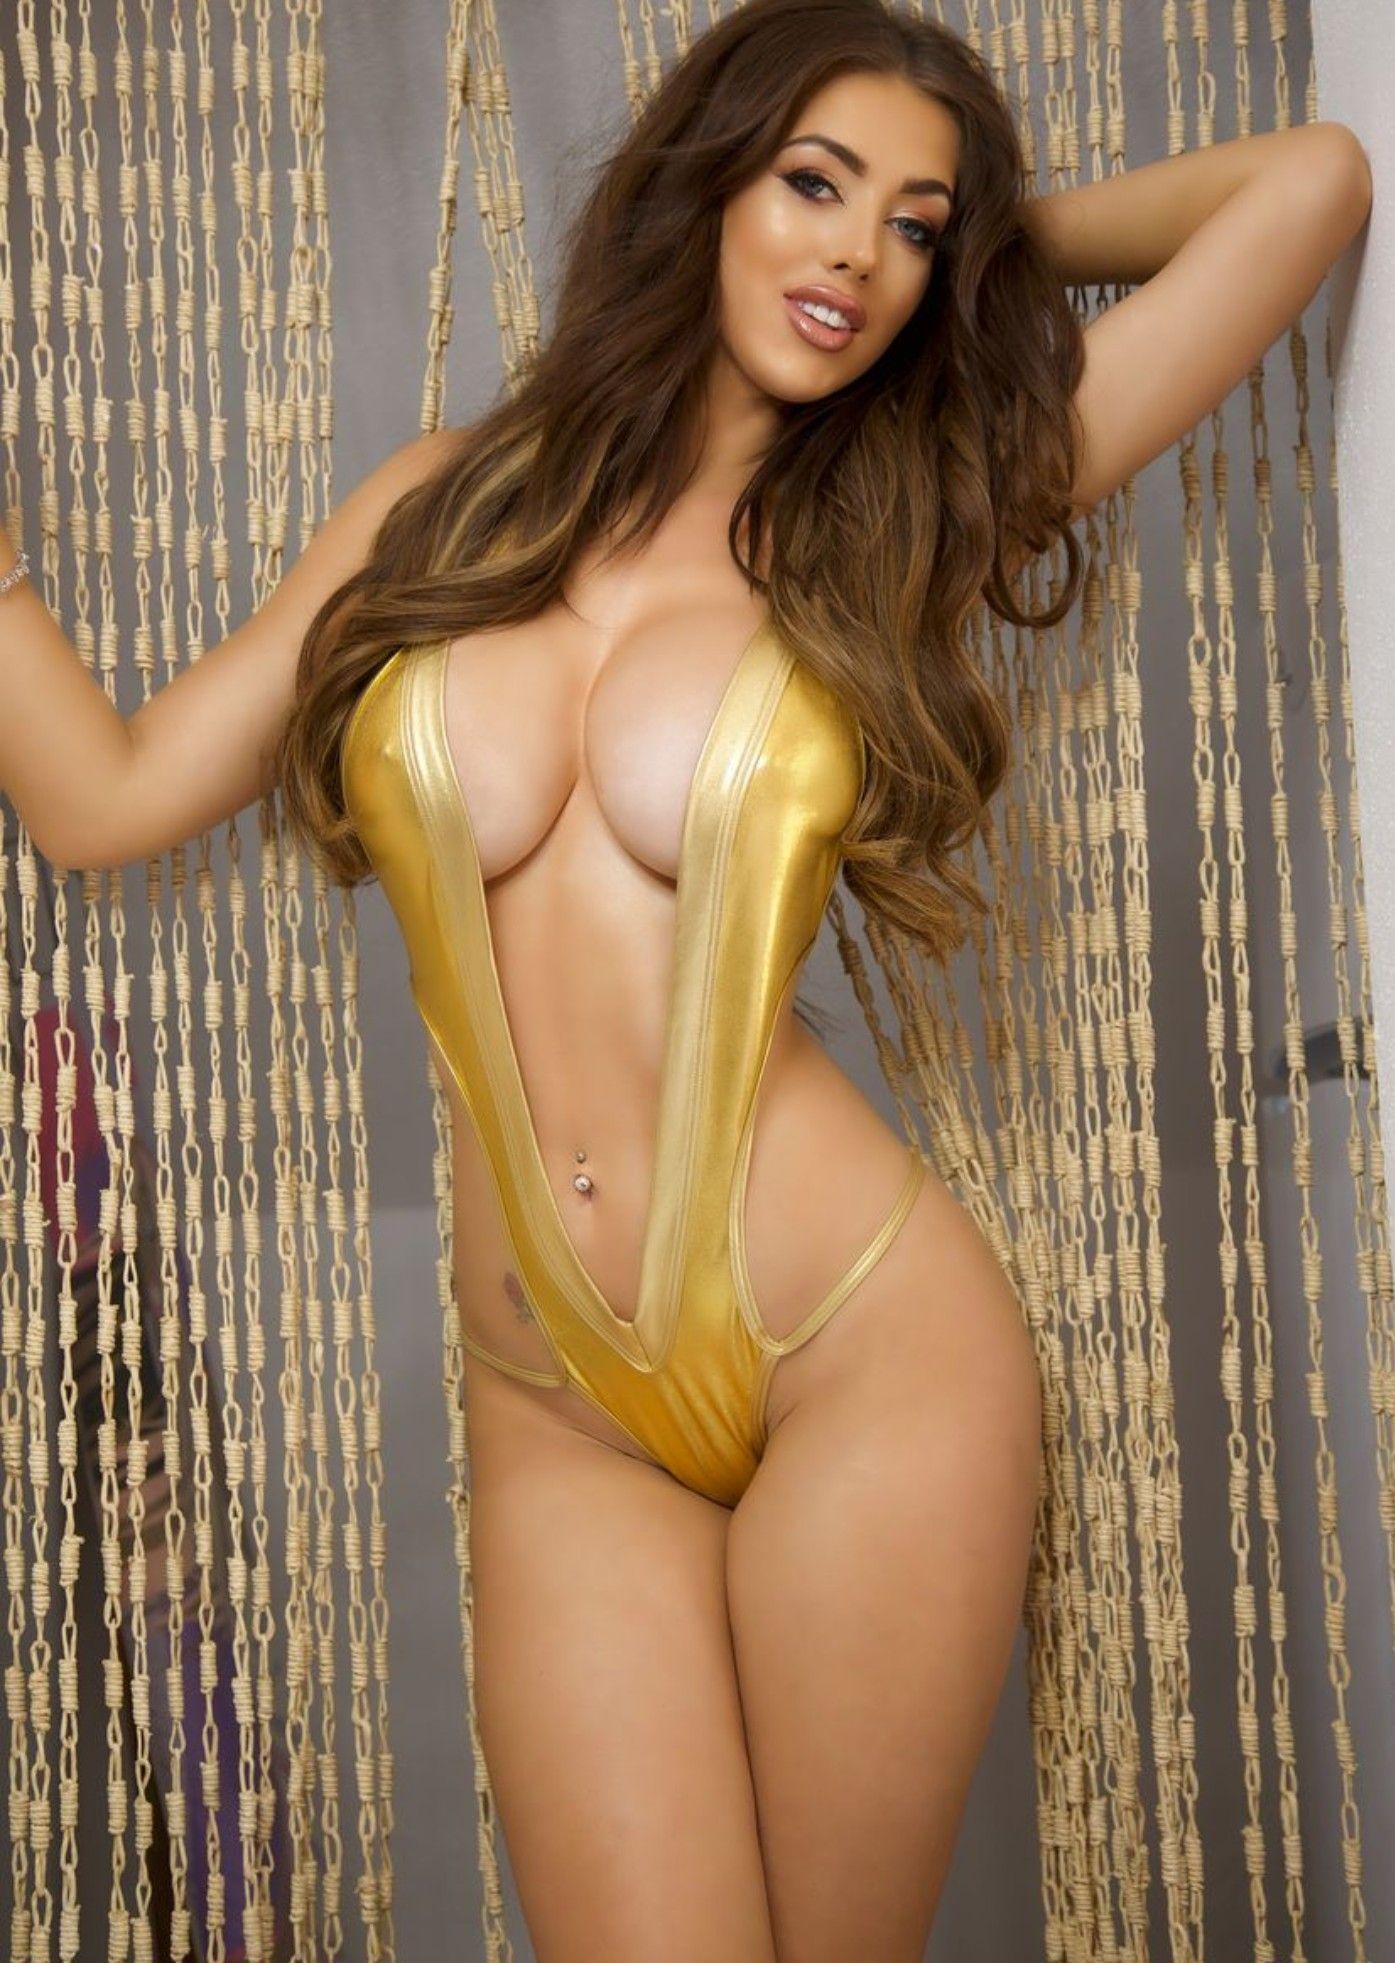 Boobs Natalia Trivino nudes (64 photos), Ass, Is a cute, Instagram, butt 2018